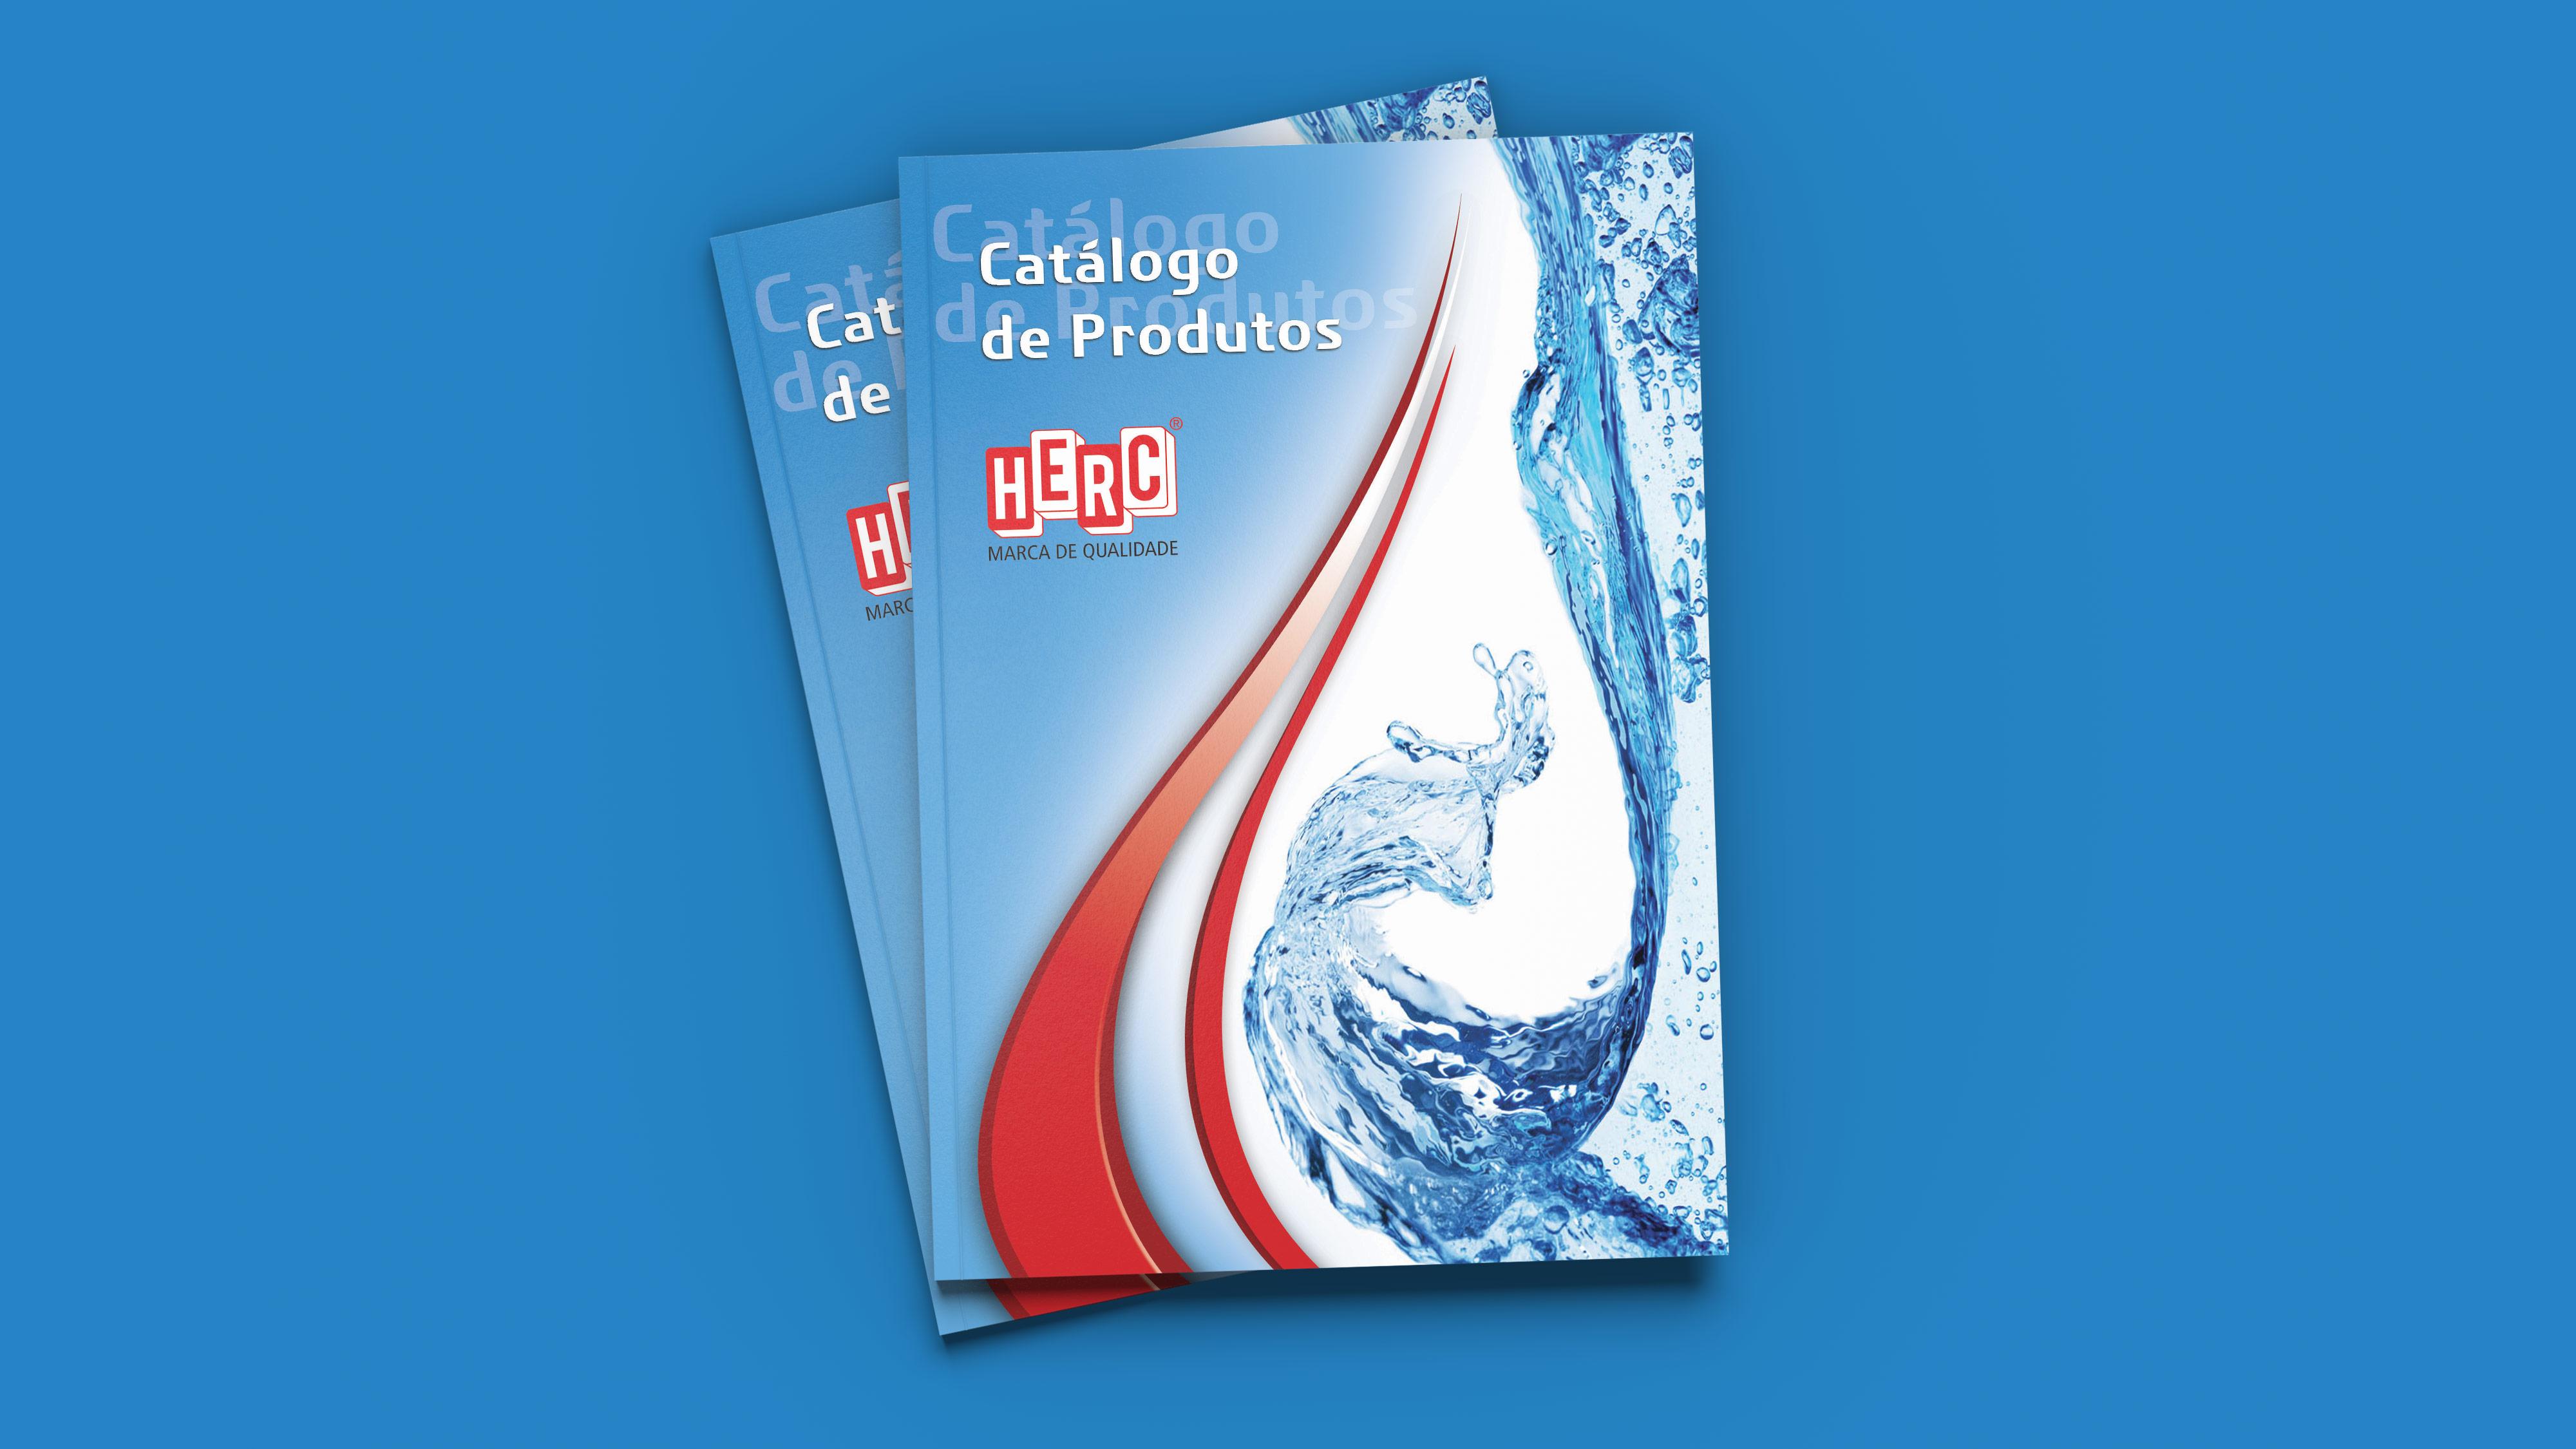 Catalogo-de-produtos-HERC-copy